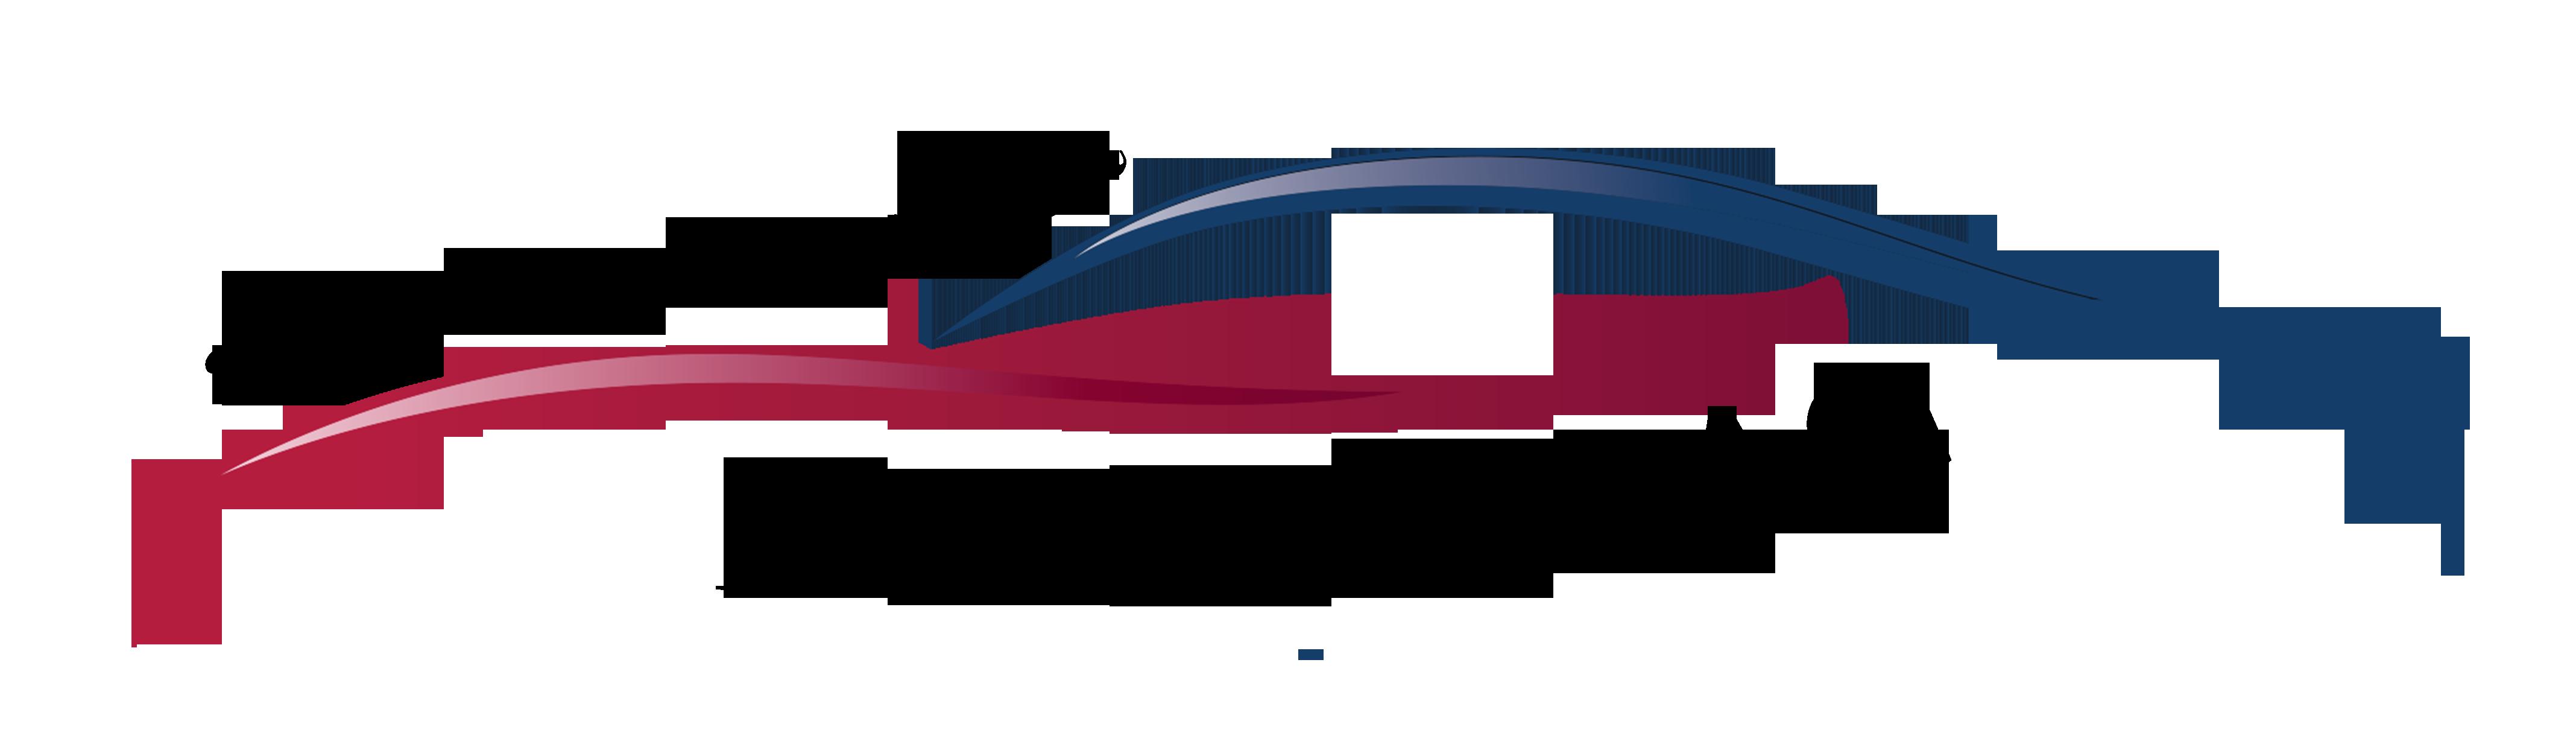 Autocarrozzeria Formula 2